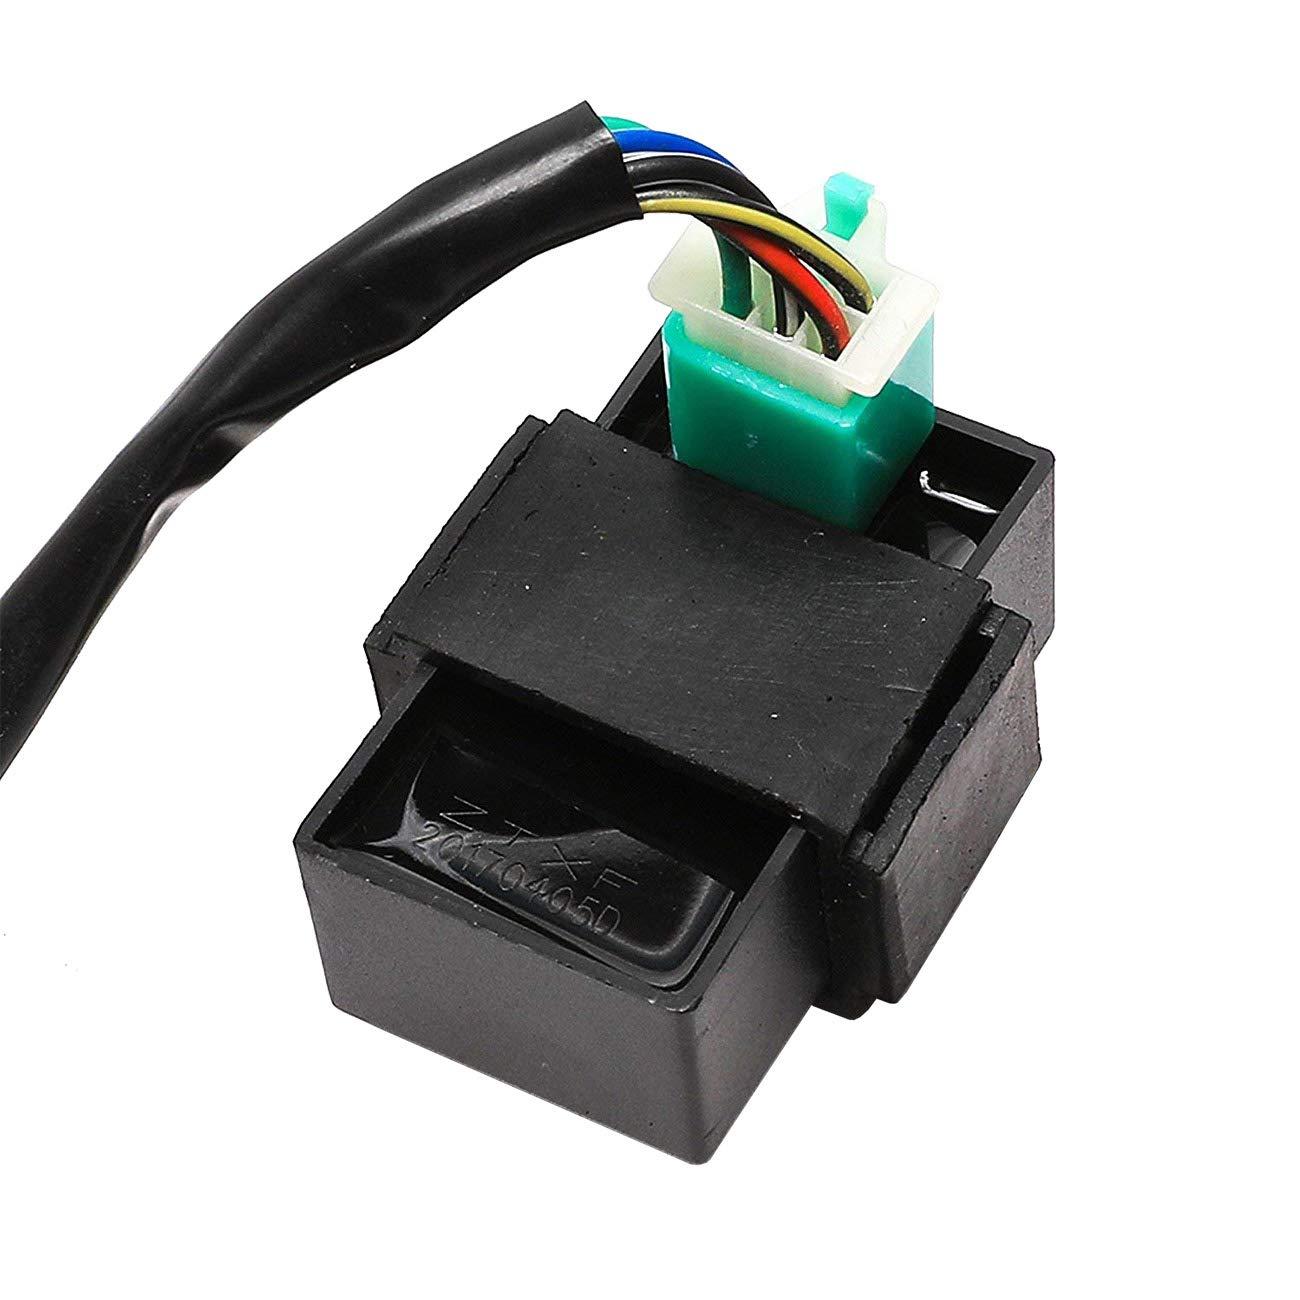 Jcmoto Wire Harness Wiring Loom Cdi Ignition Coil Spark Ssr Pit Bike Plug Rebuild Kit For Kick Start Dirt Atv 50 160cc Automotive